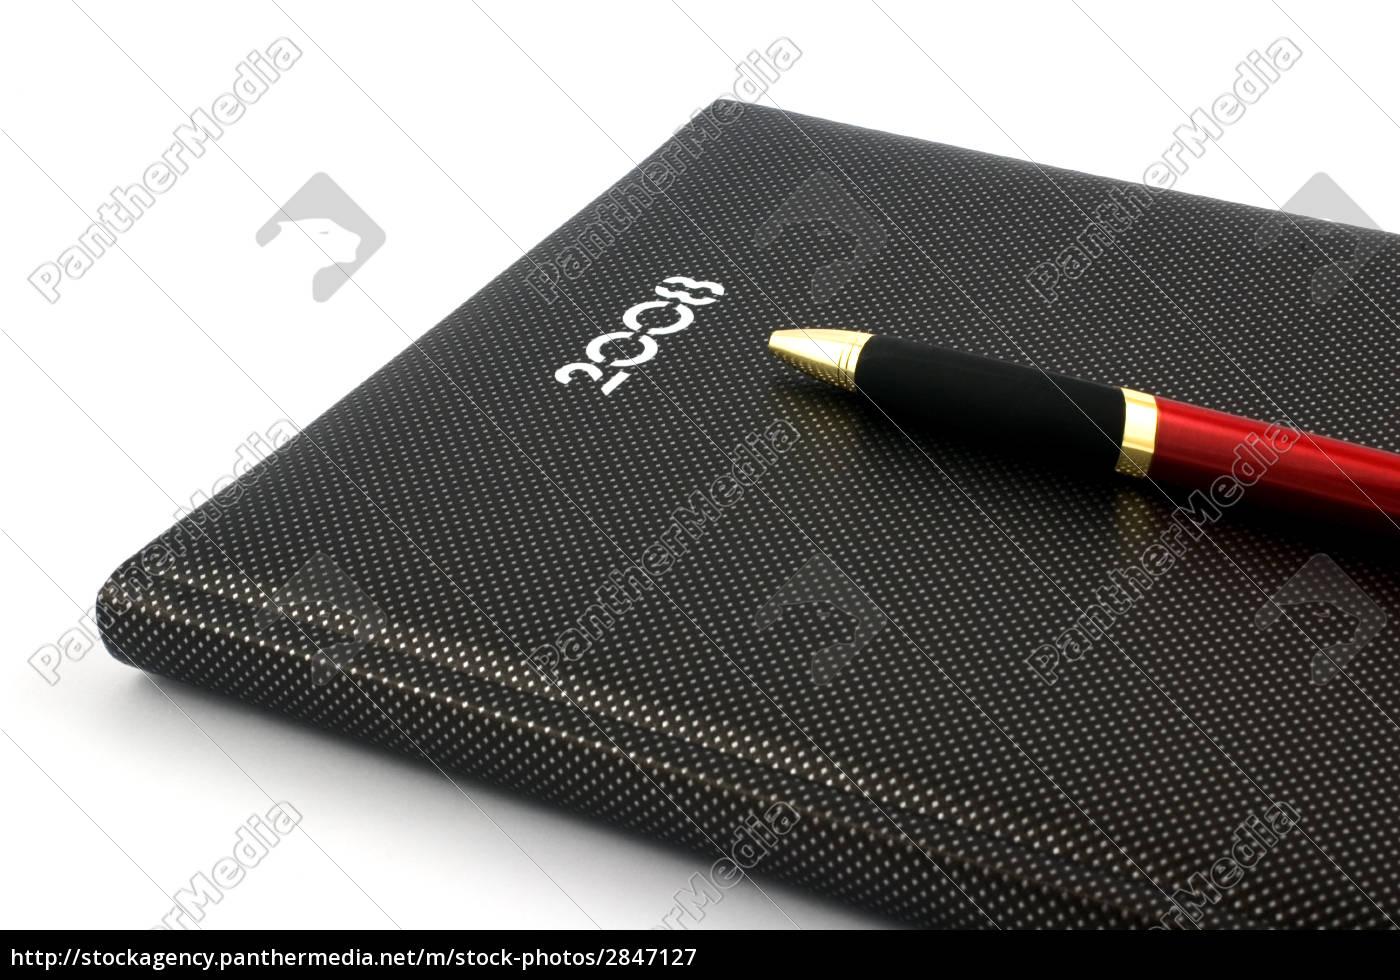 agenda, 2008, and, pen - 2847127